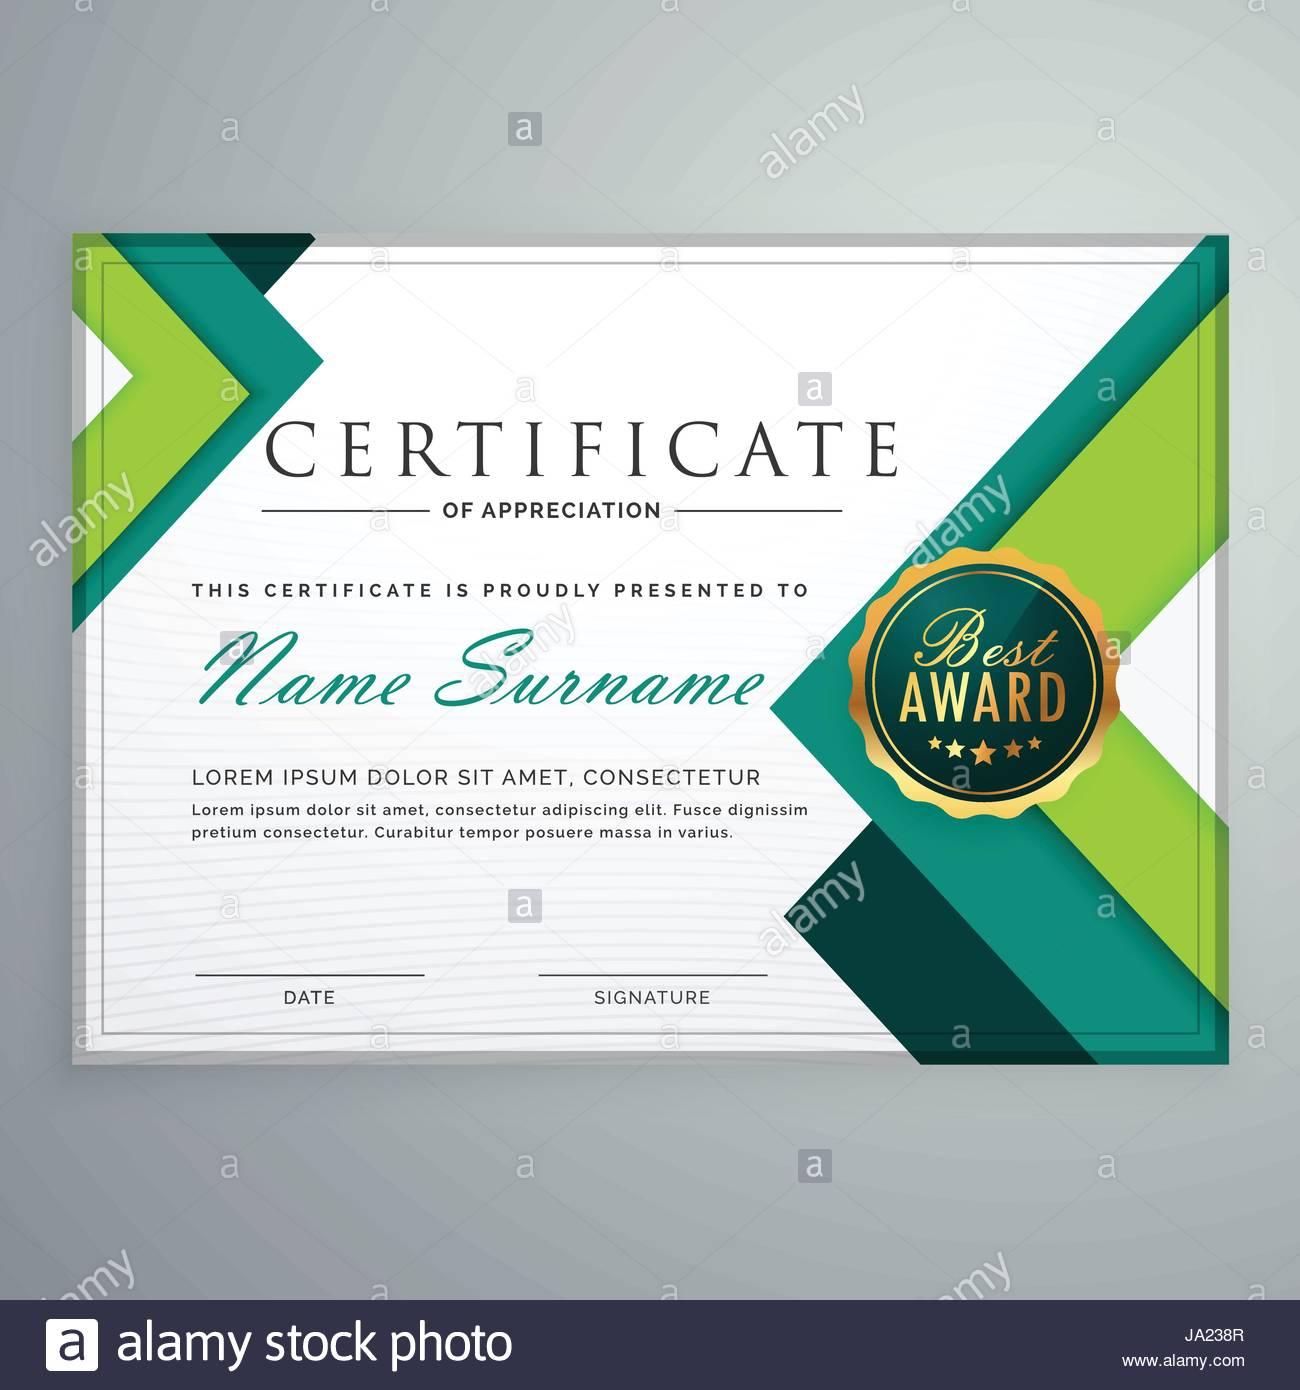 Modern Geometric Shape Certificate Design Template Stock Vector Art Illustration Vector Image